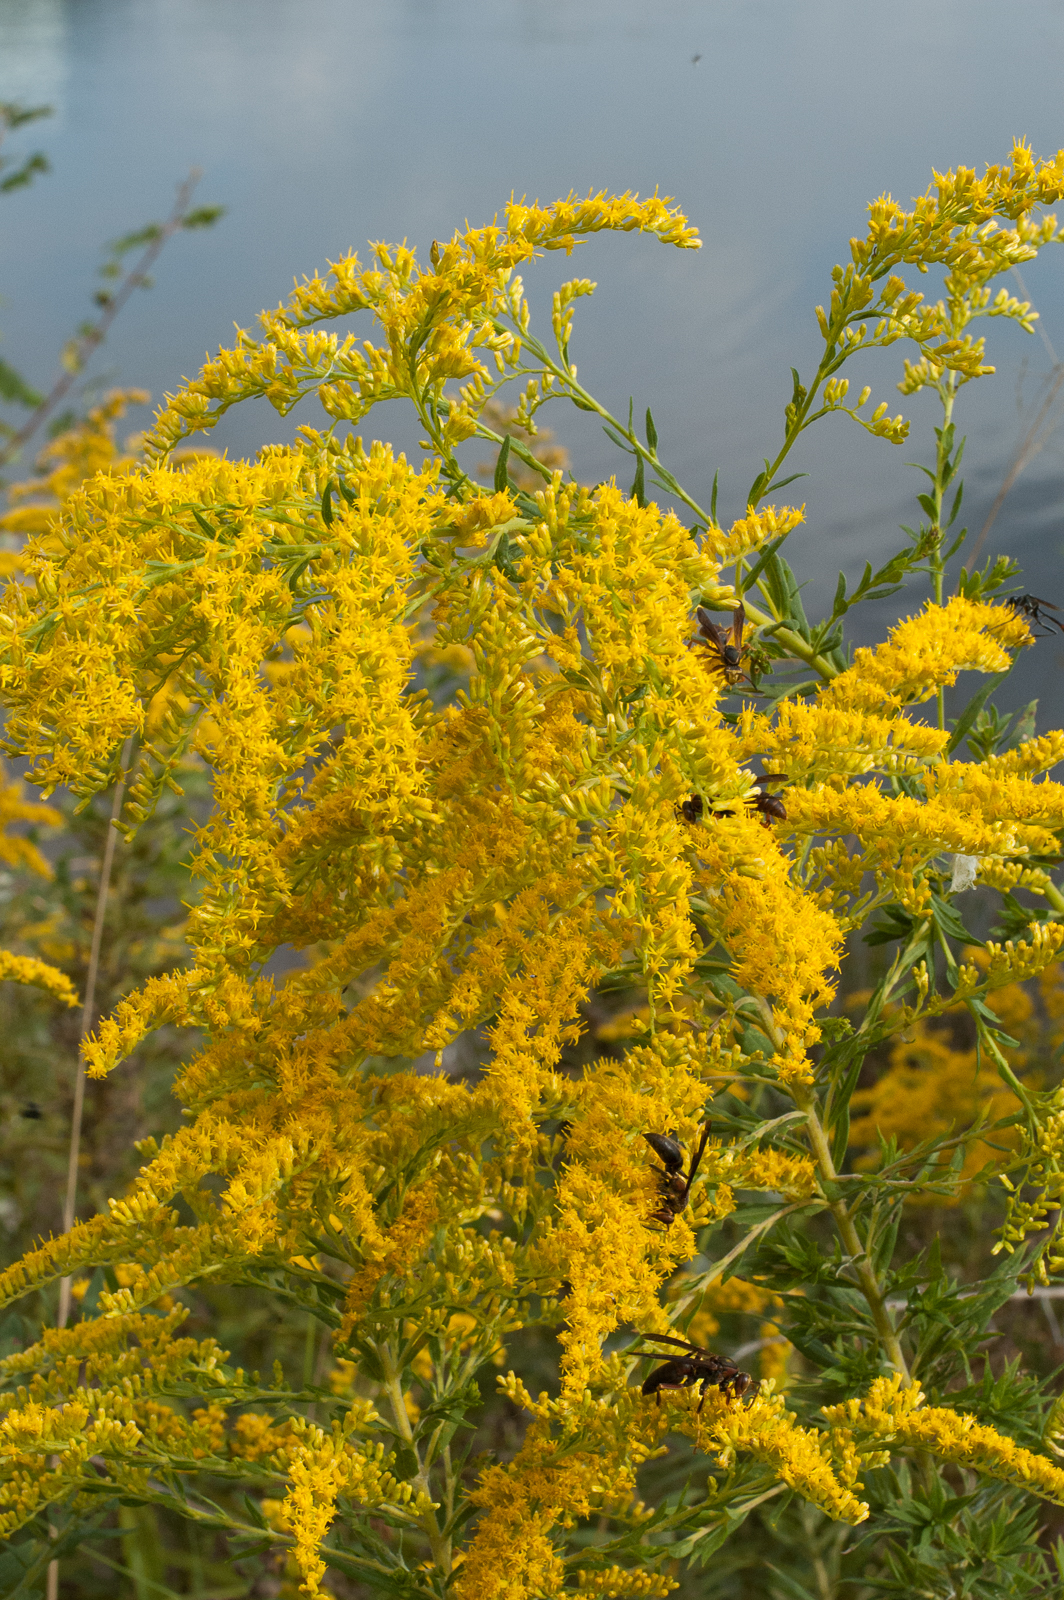 Golderrod Flowers